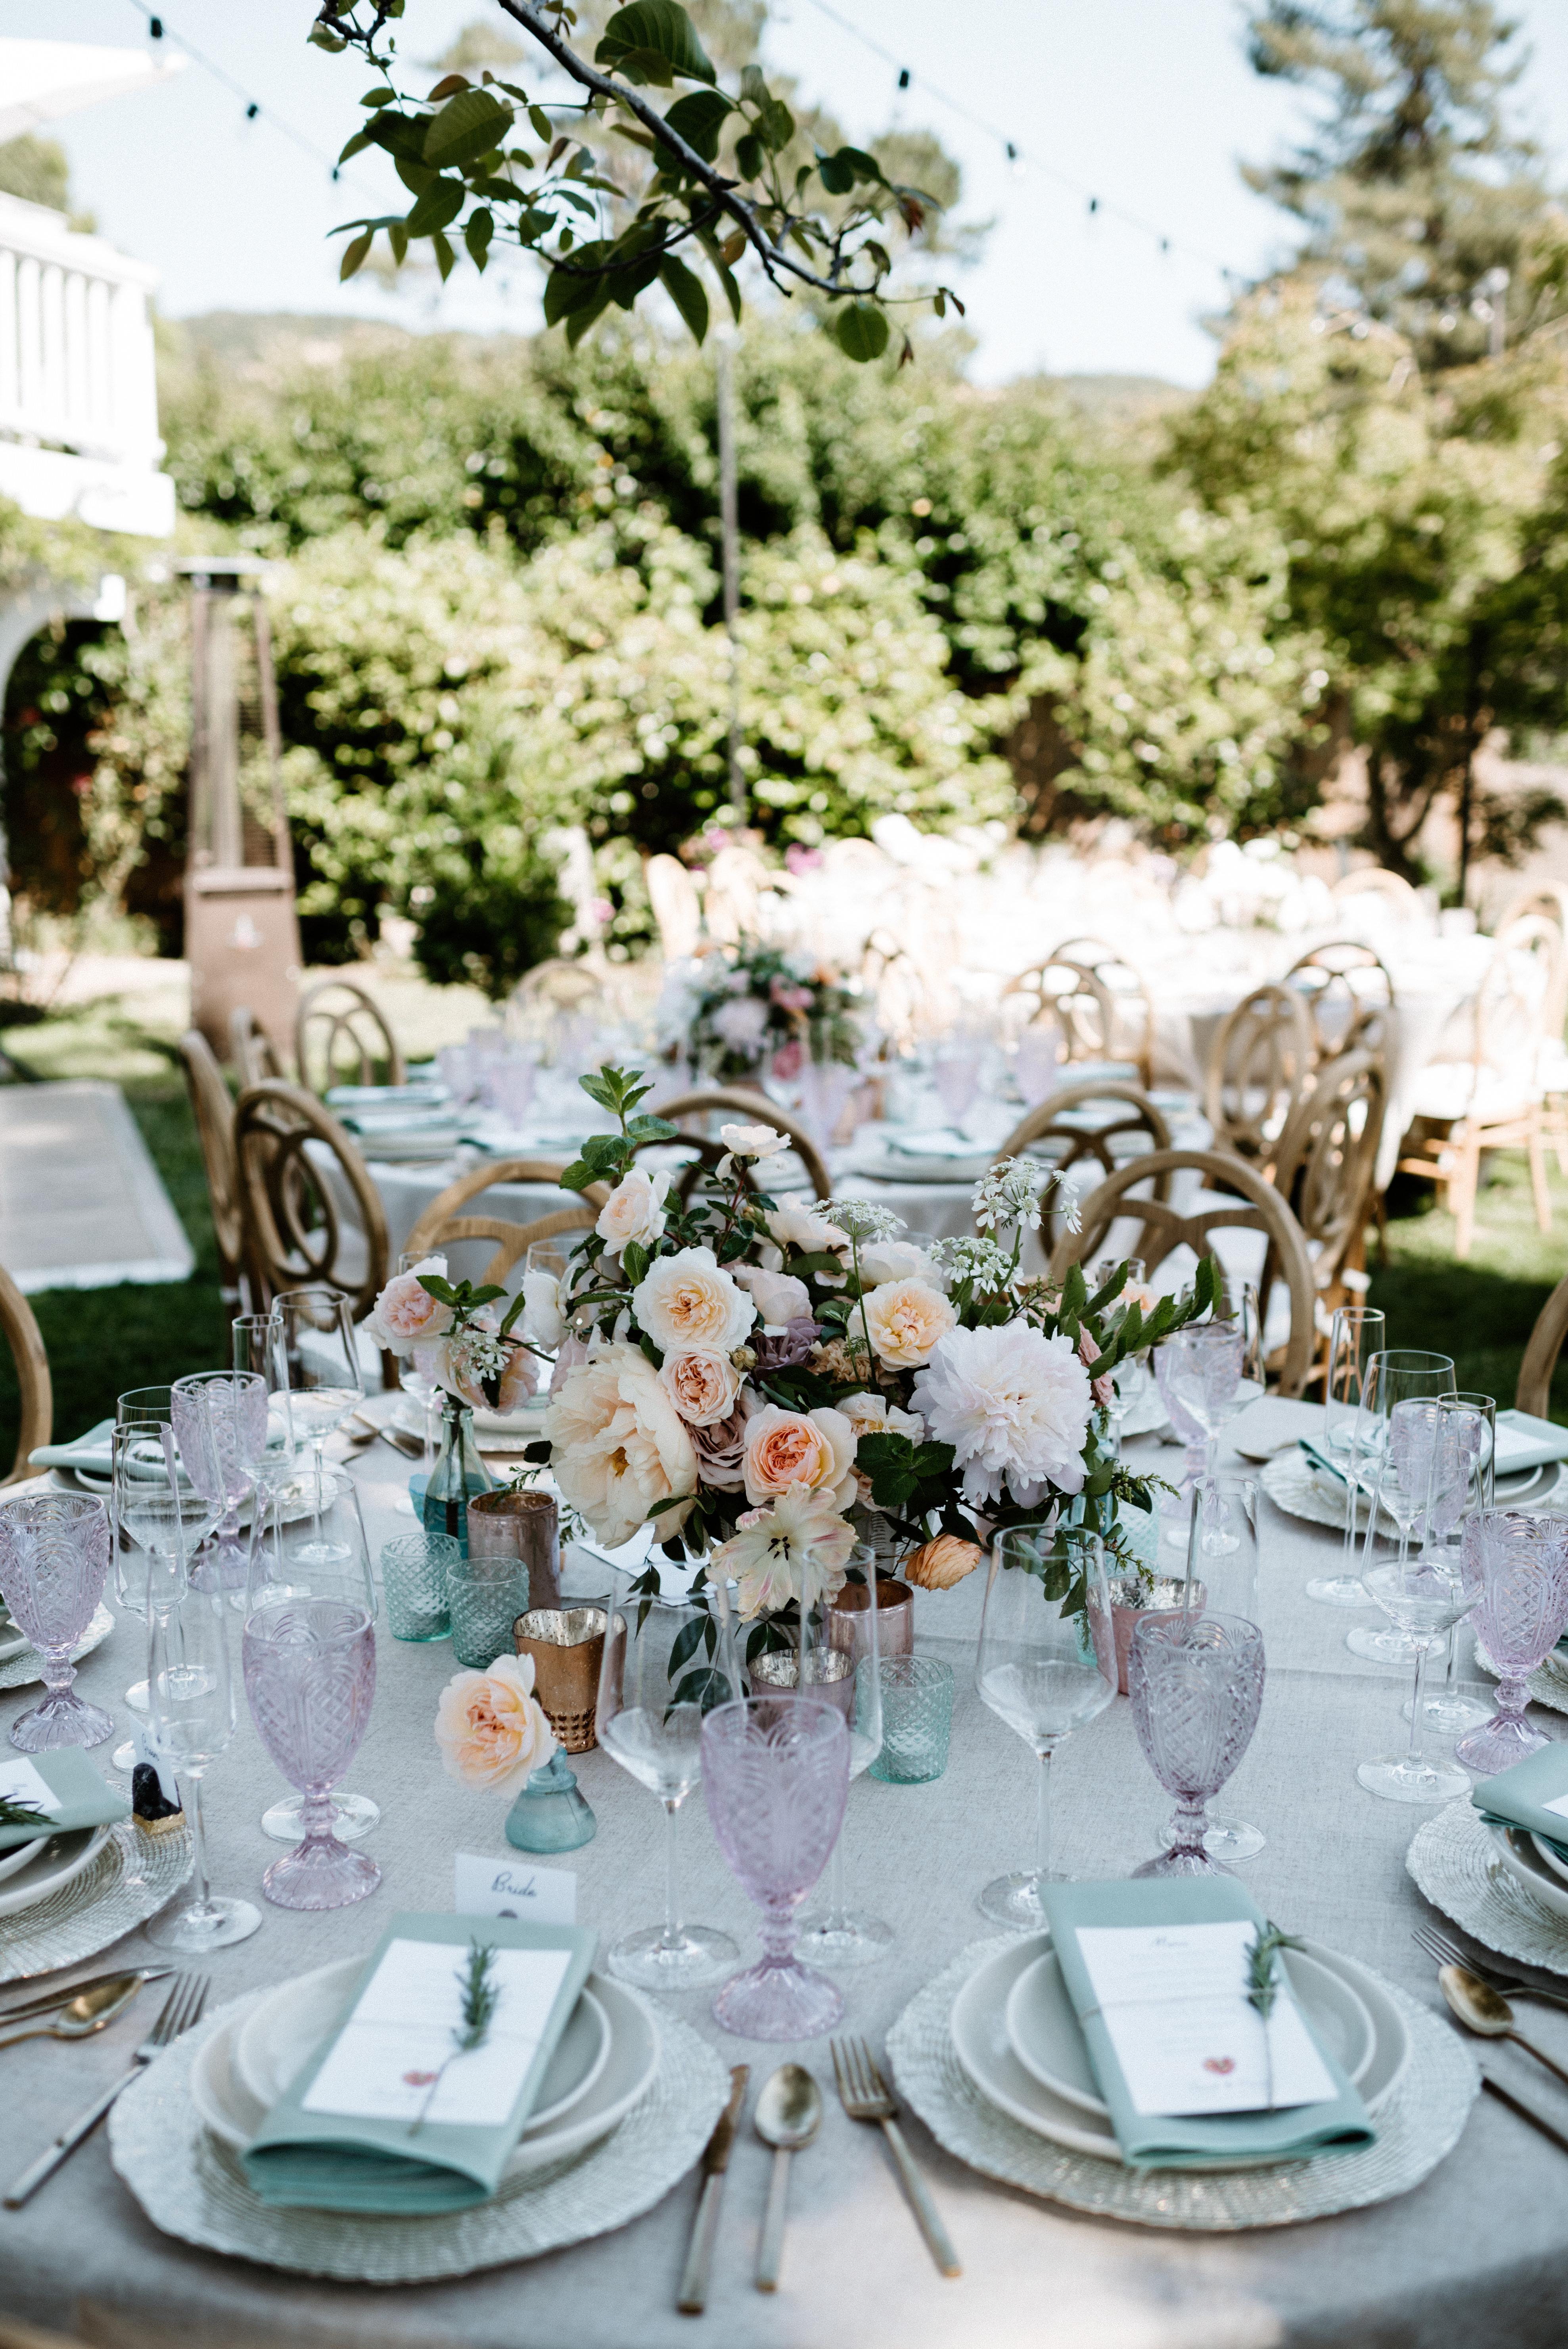 Ethereal Summer Wedding - One True Love Vintage Rentals